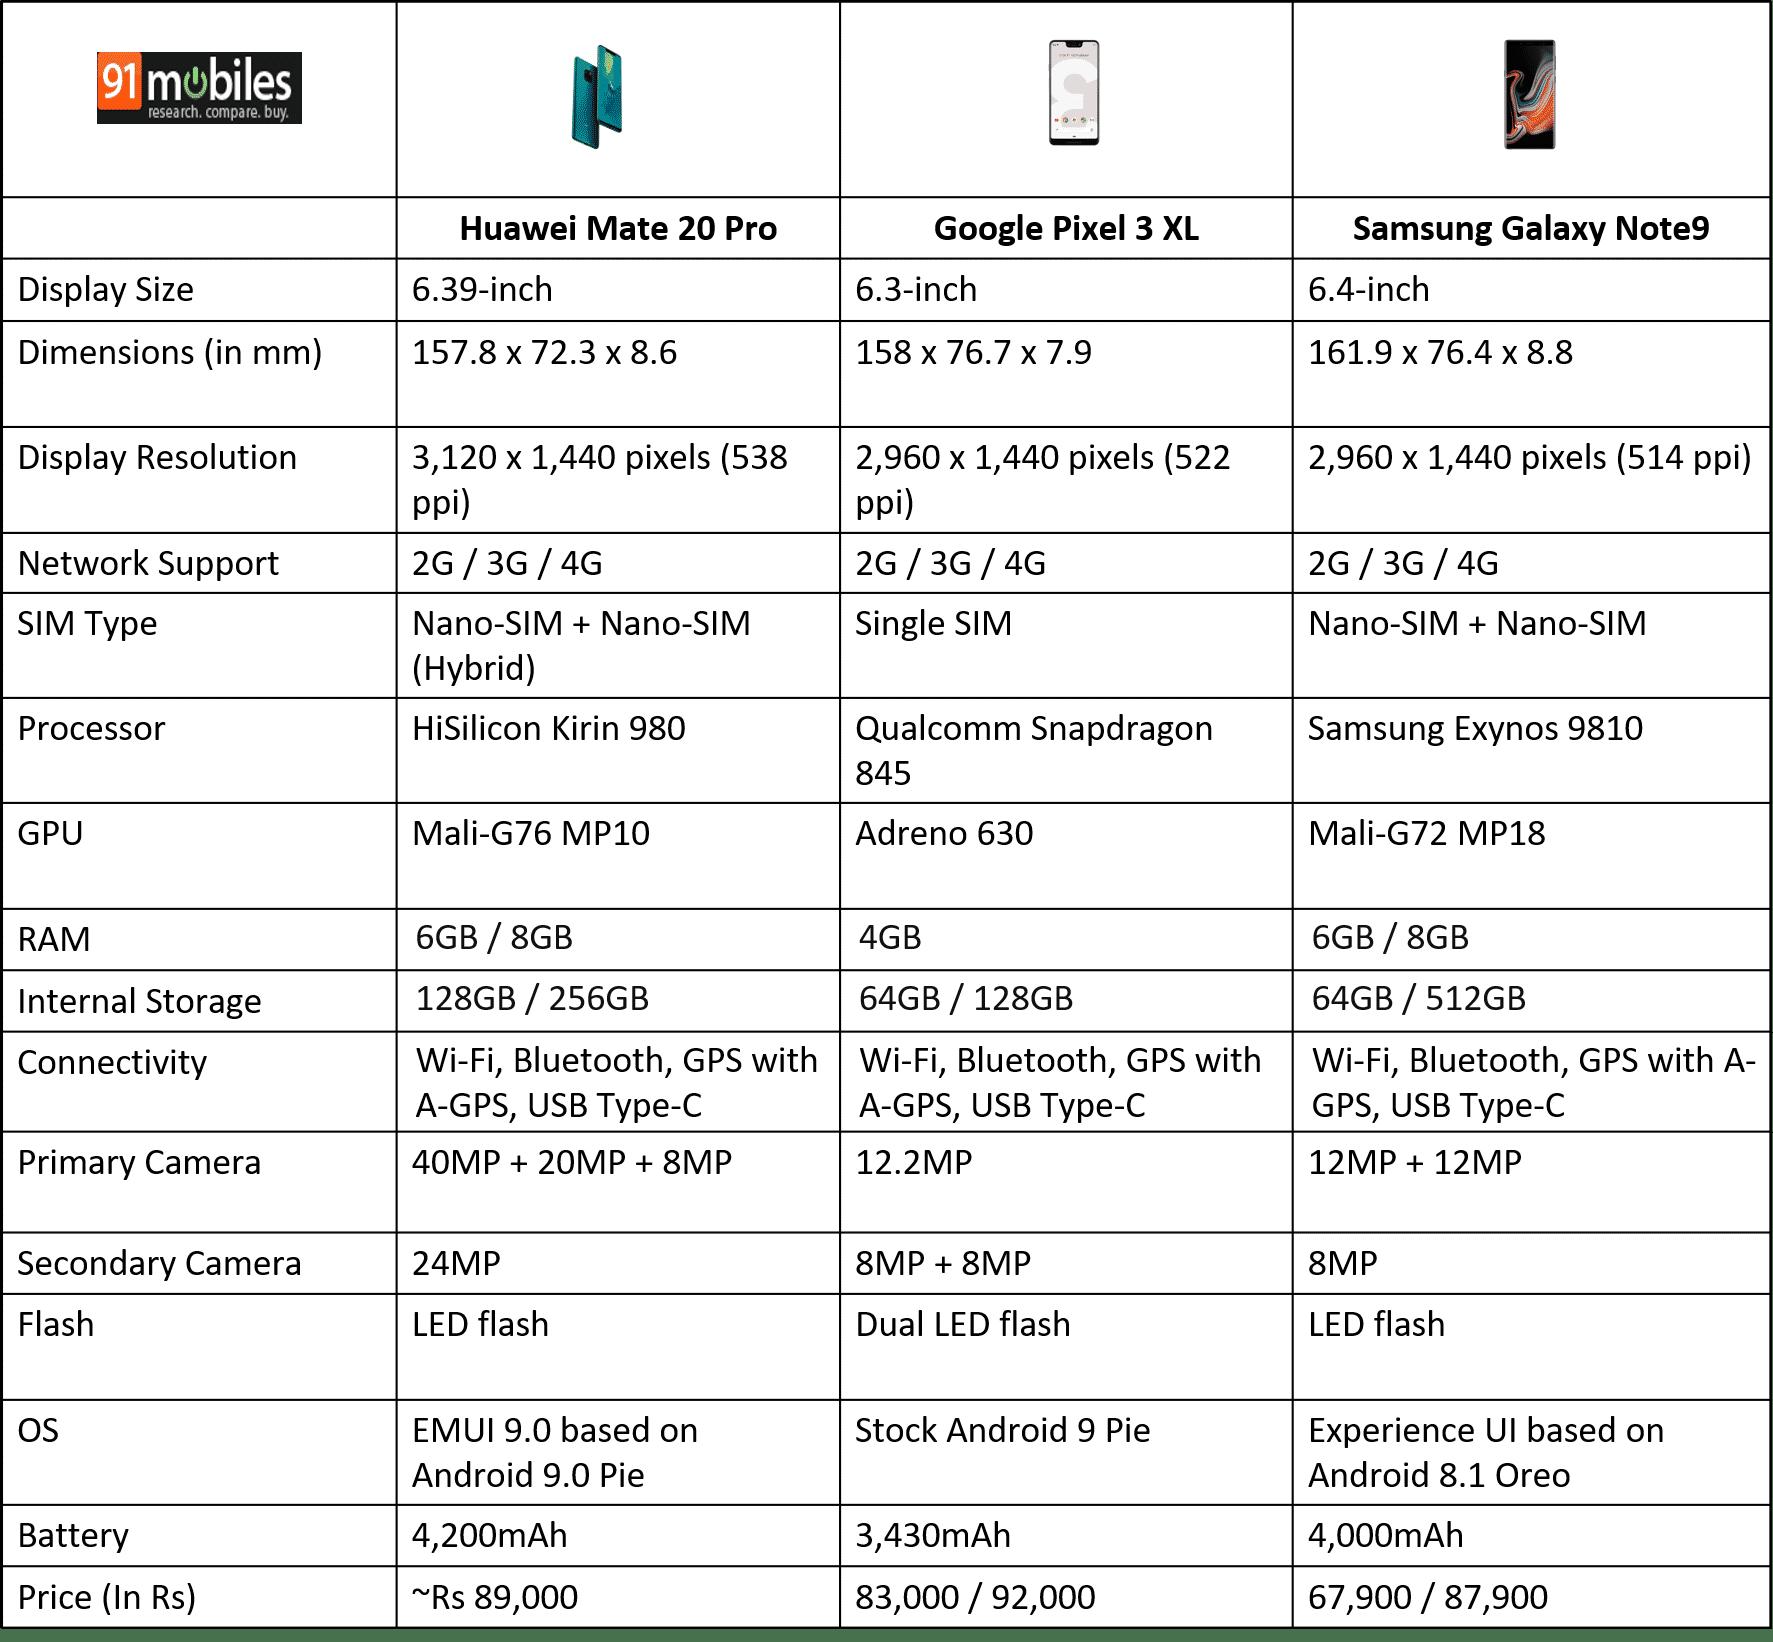 Huawei Mate 20 Pro vs Google Pixel 3 Xl vs Samsung Galaxy Note9